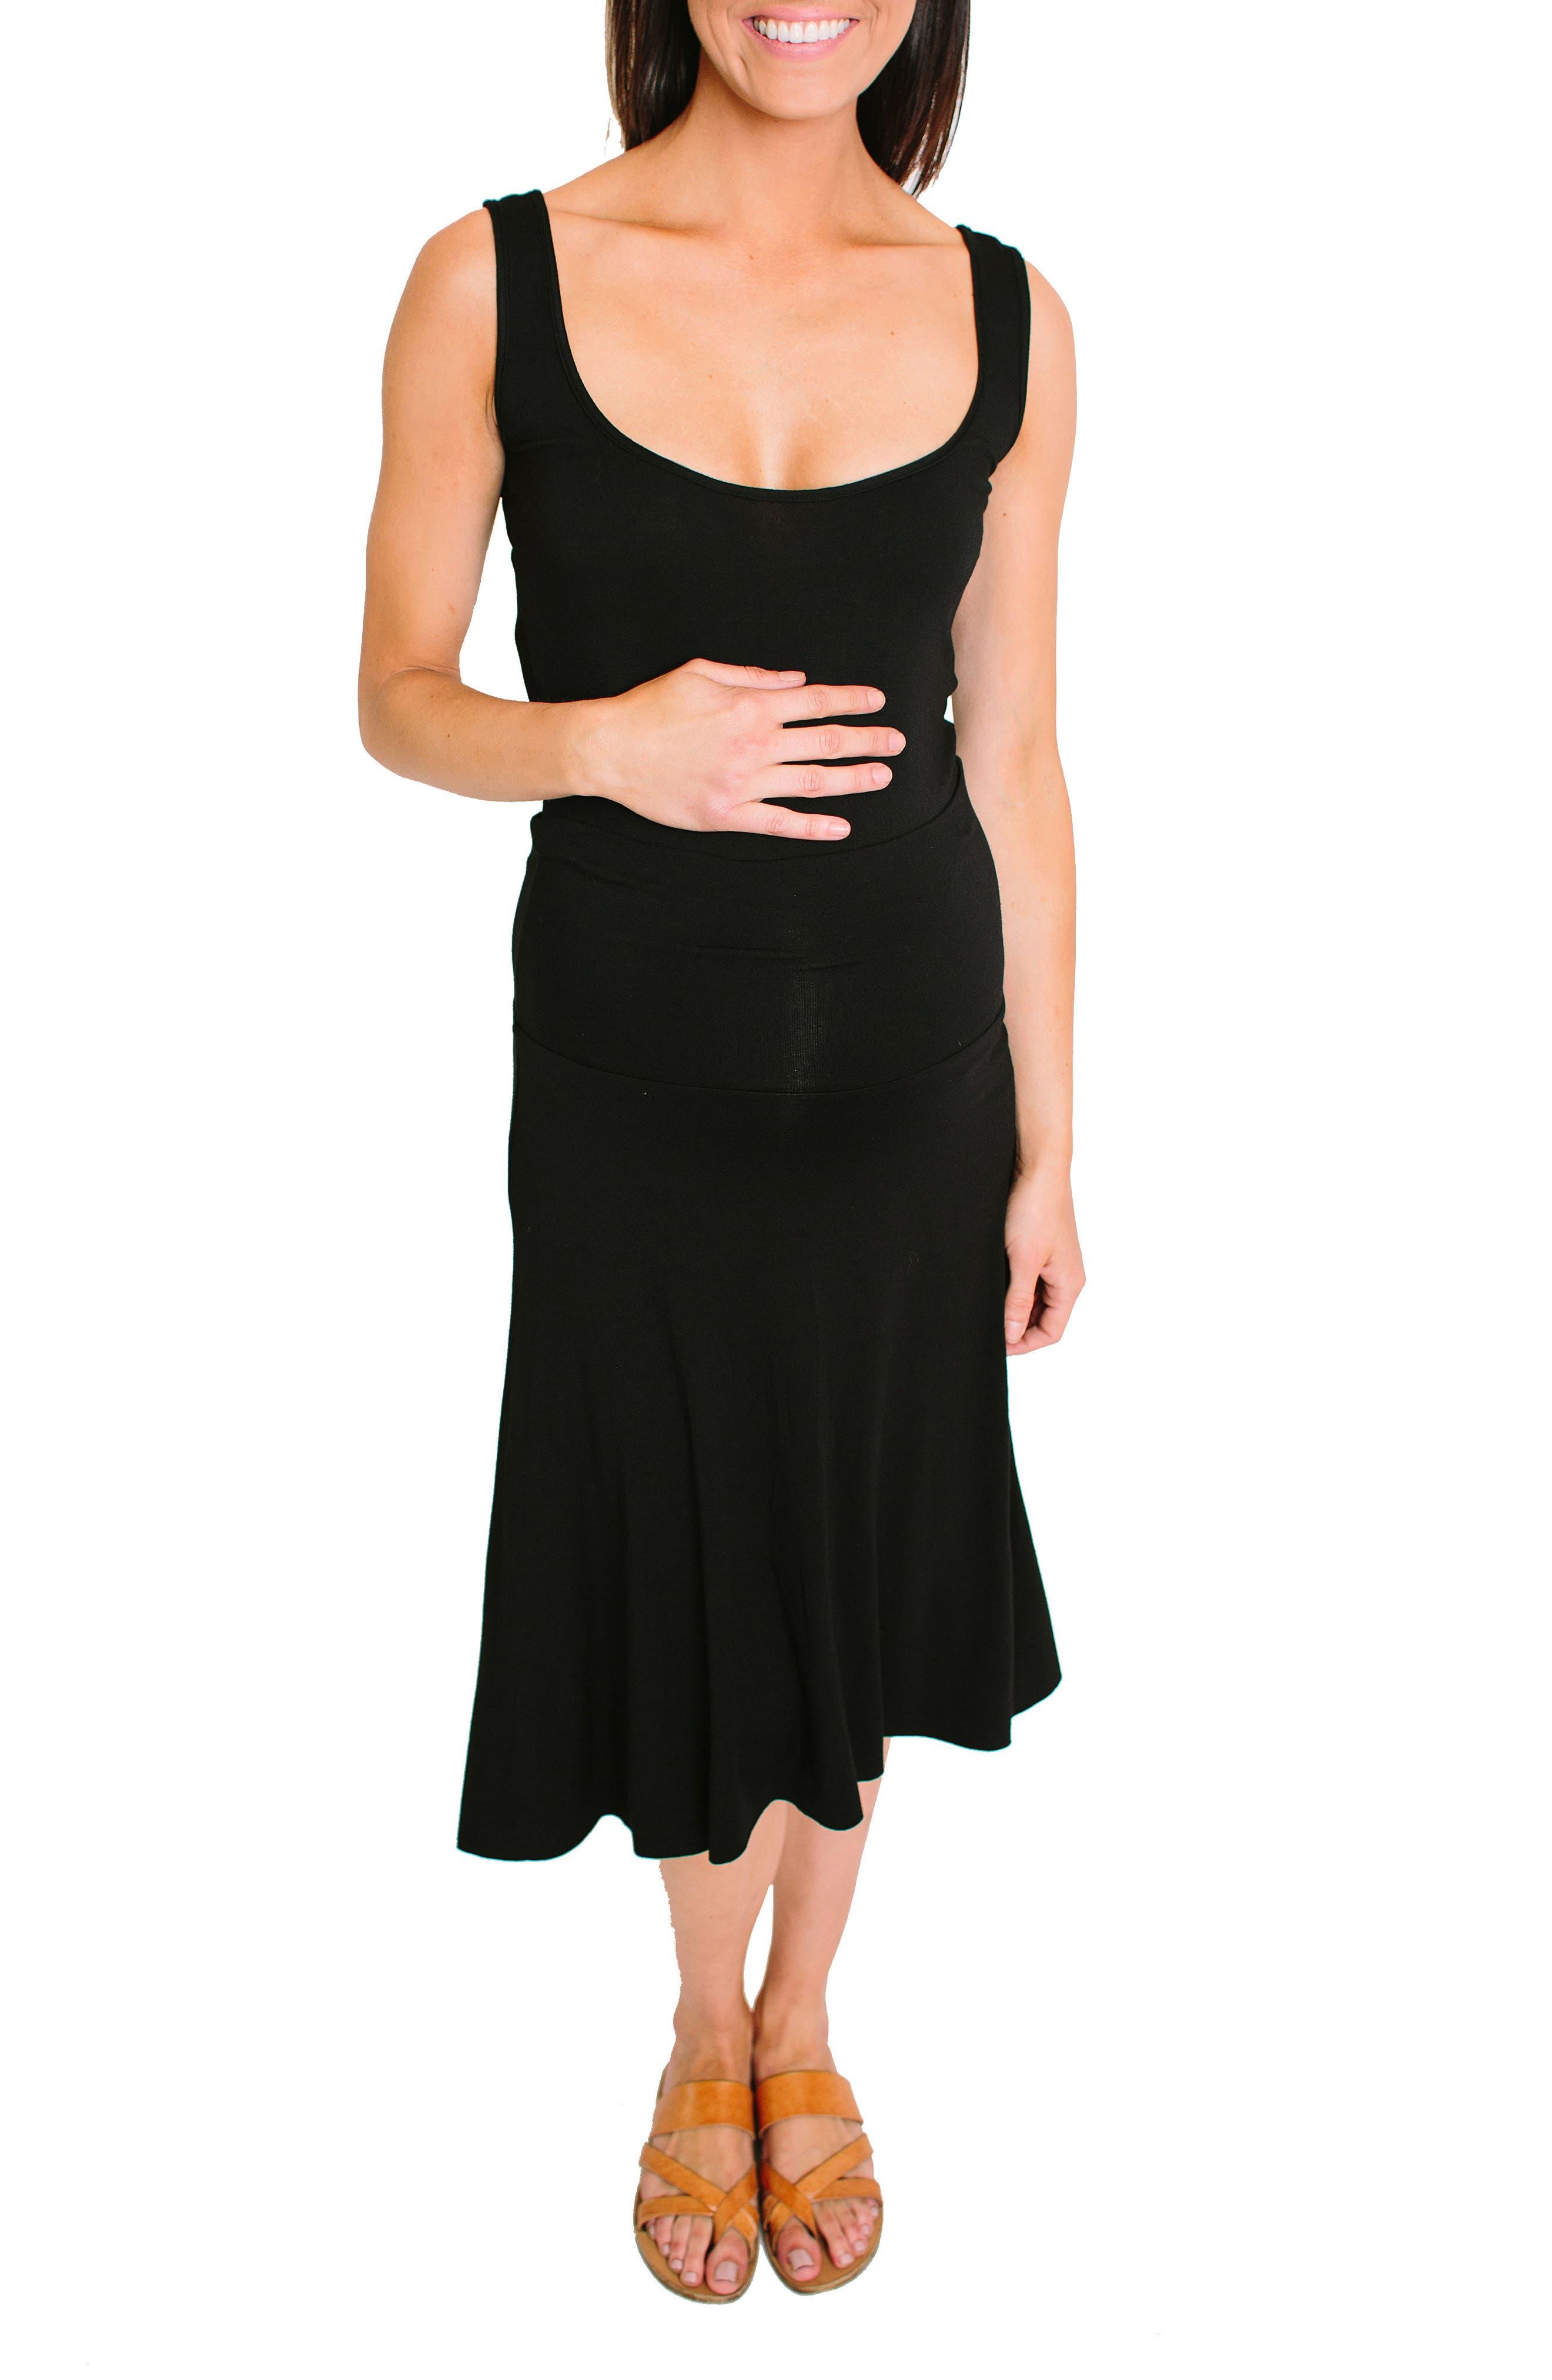 NOM Nola Maternity Skirt,                         Main,                         color, BLACK